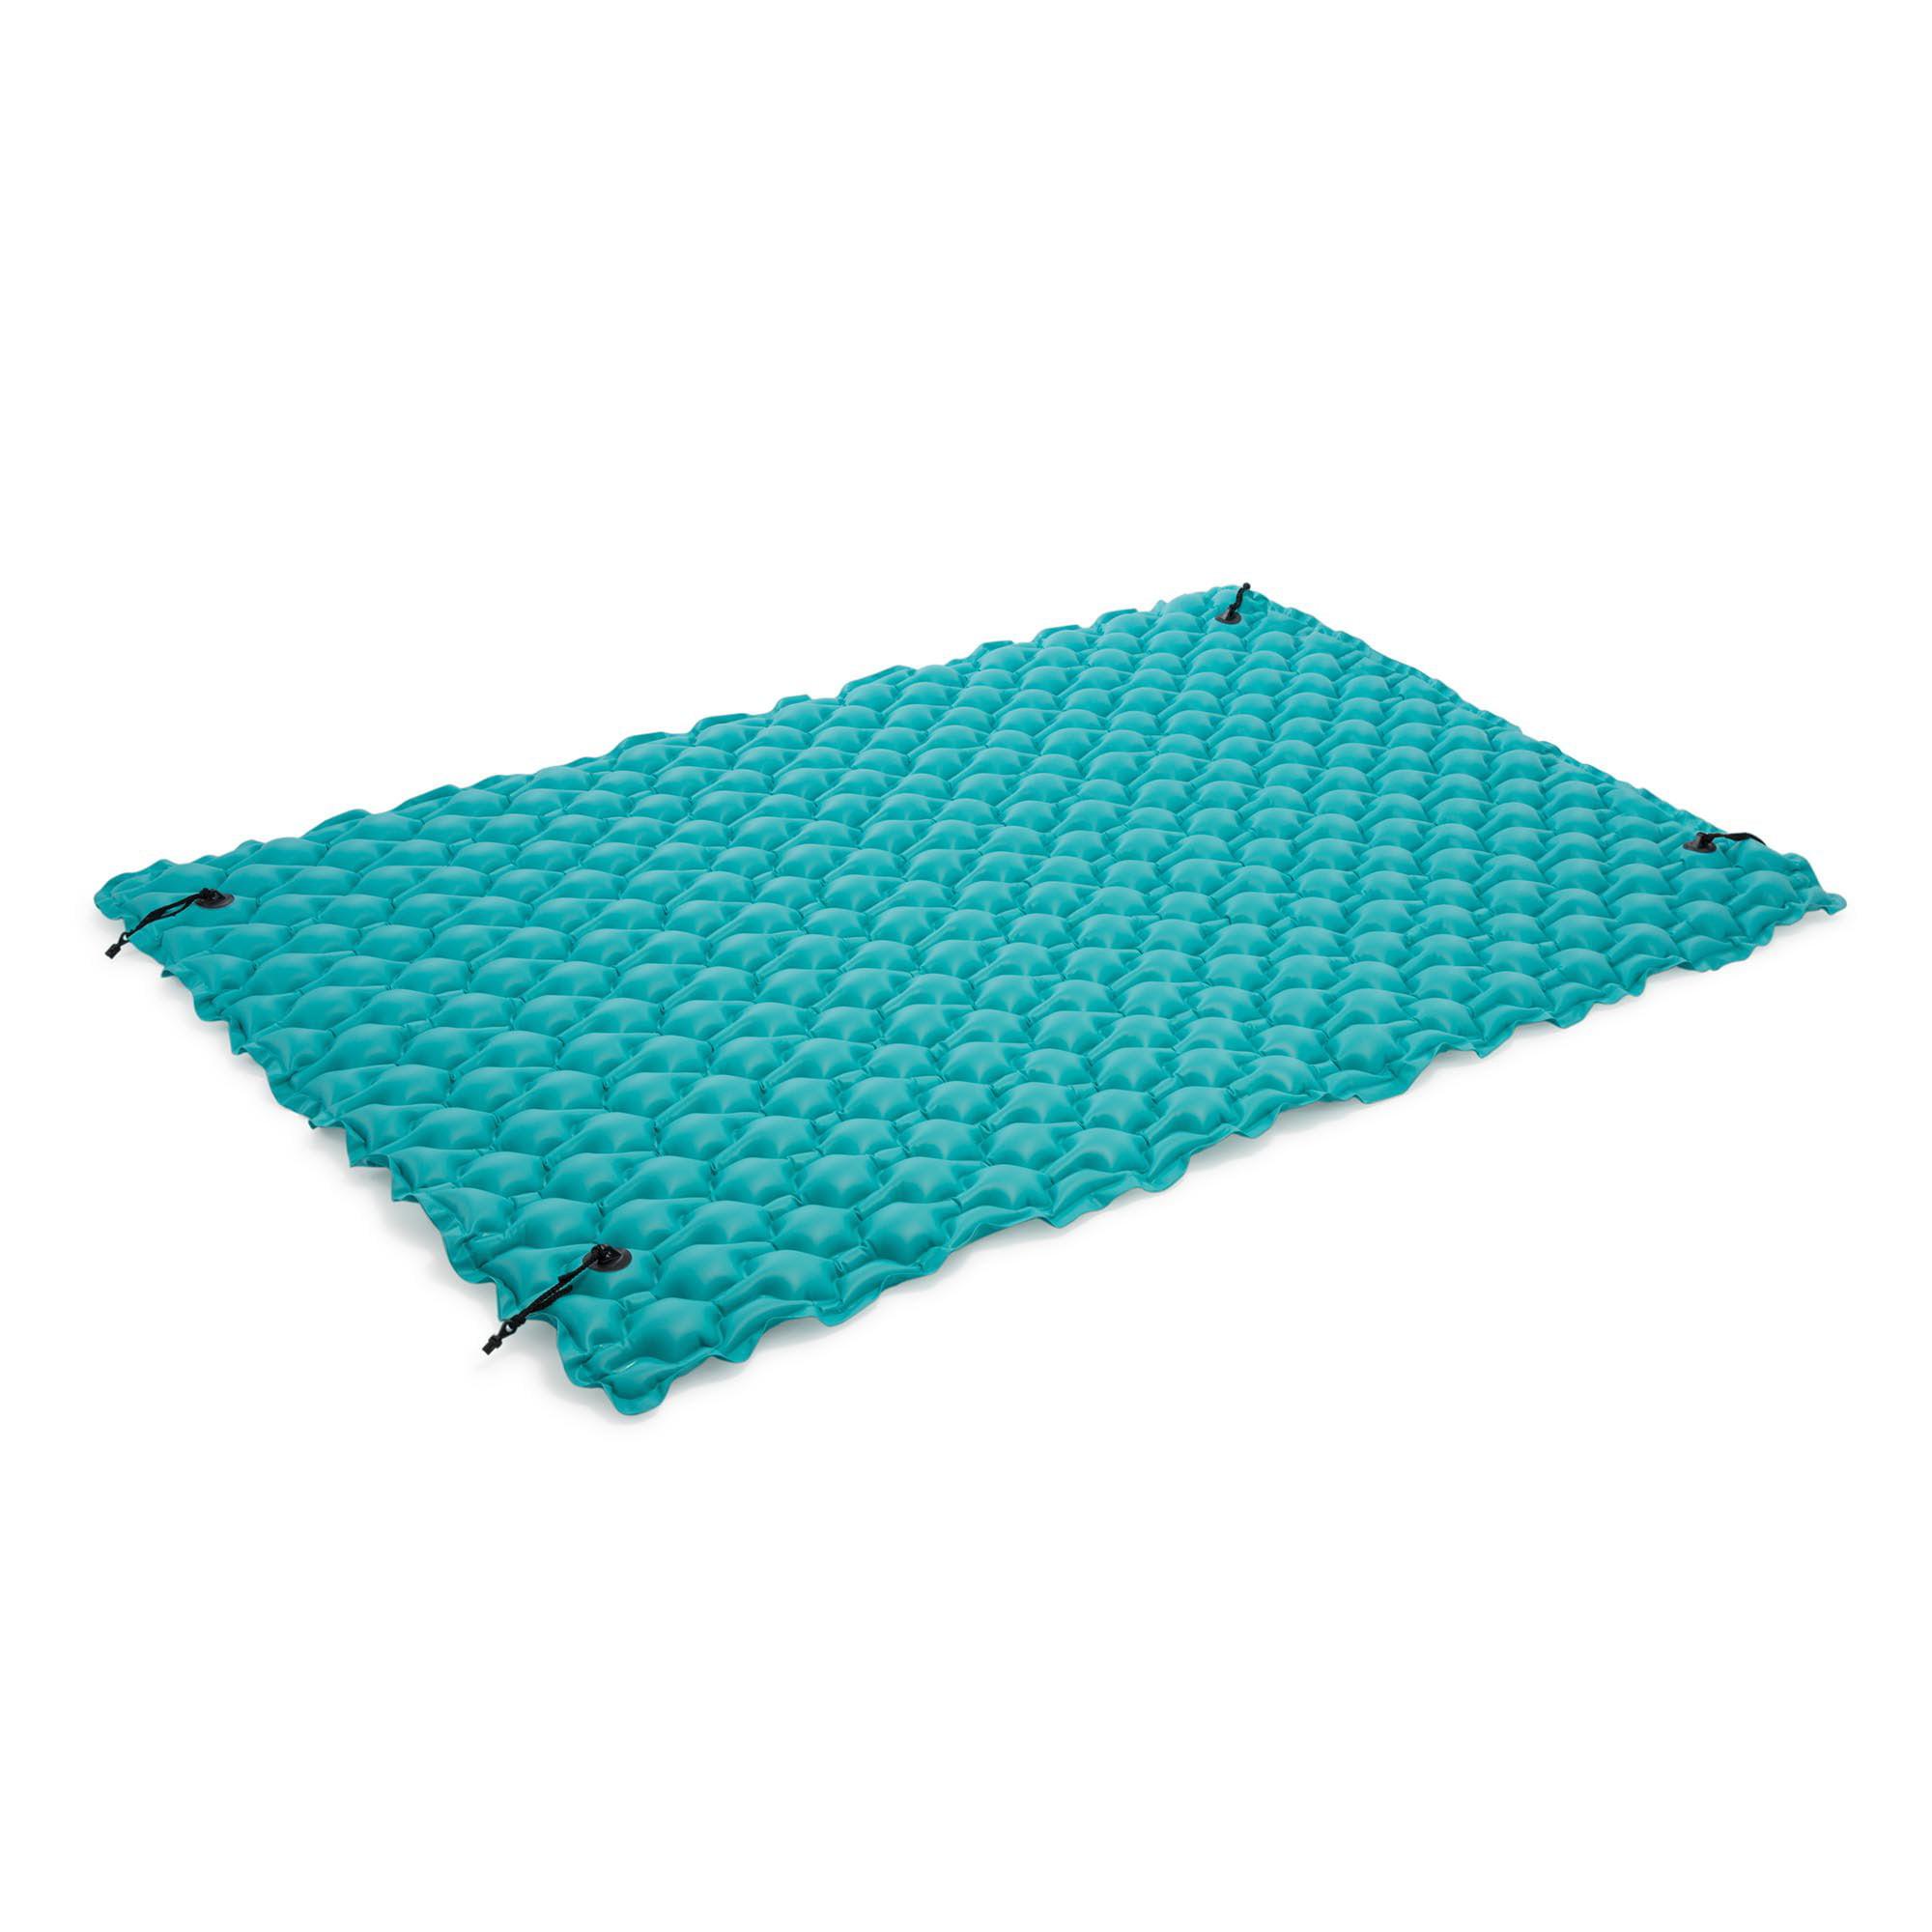 Intex Giant 9.5' Inflatable Floating Water Swimming Pool Lake Mat Platform Pad by Intex